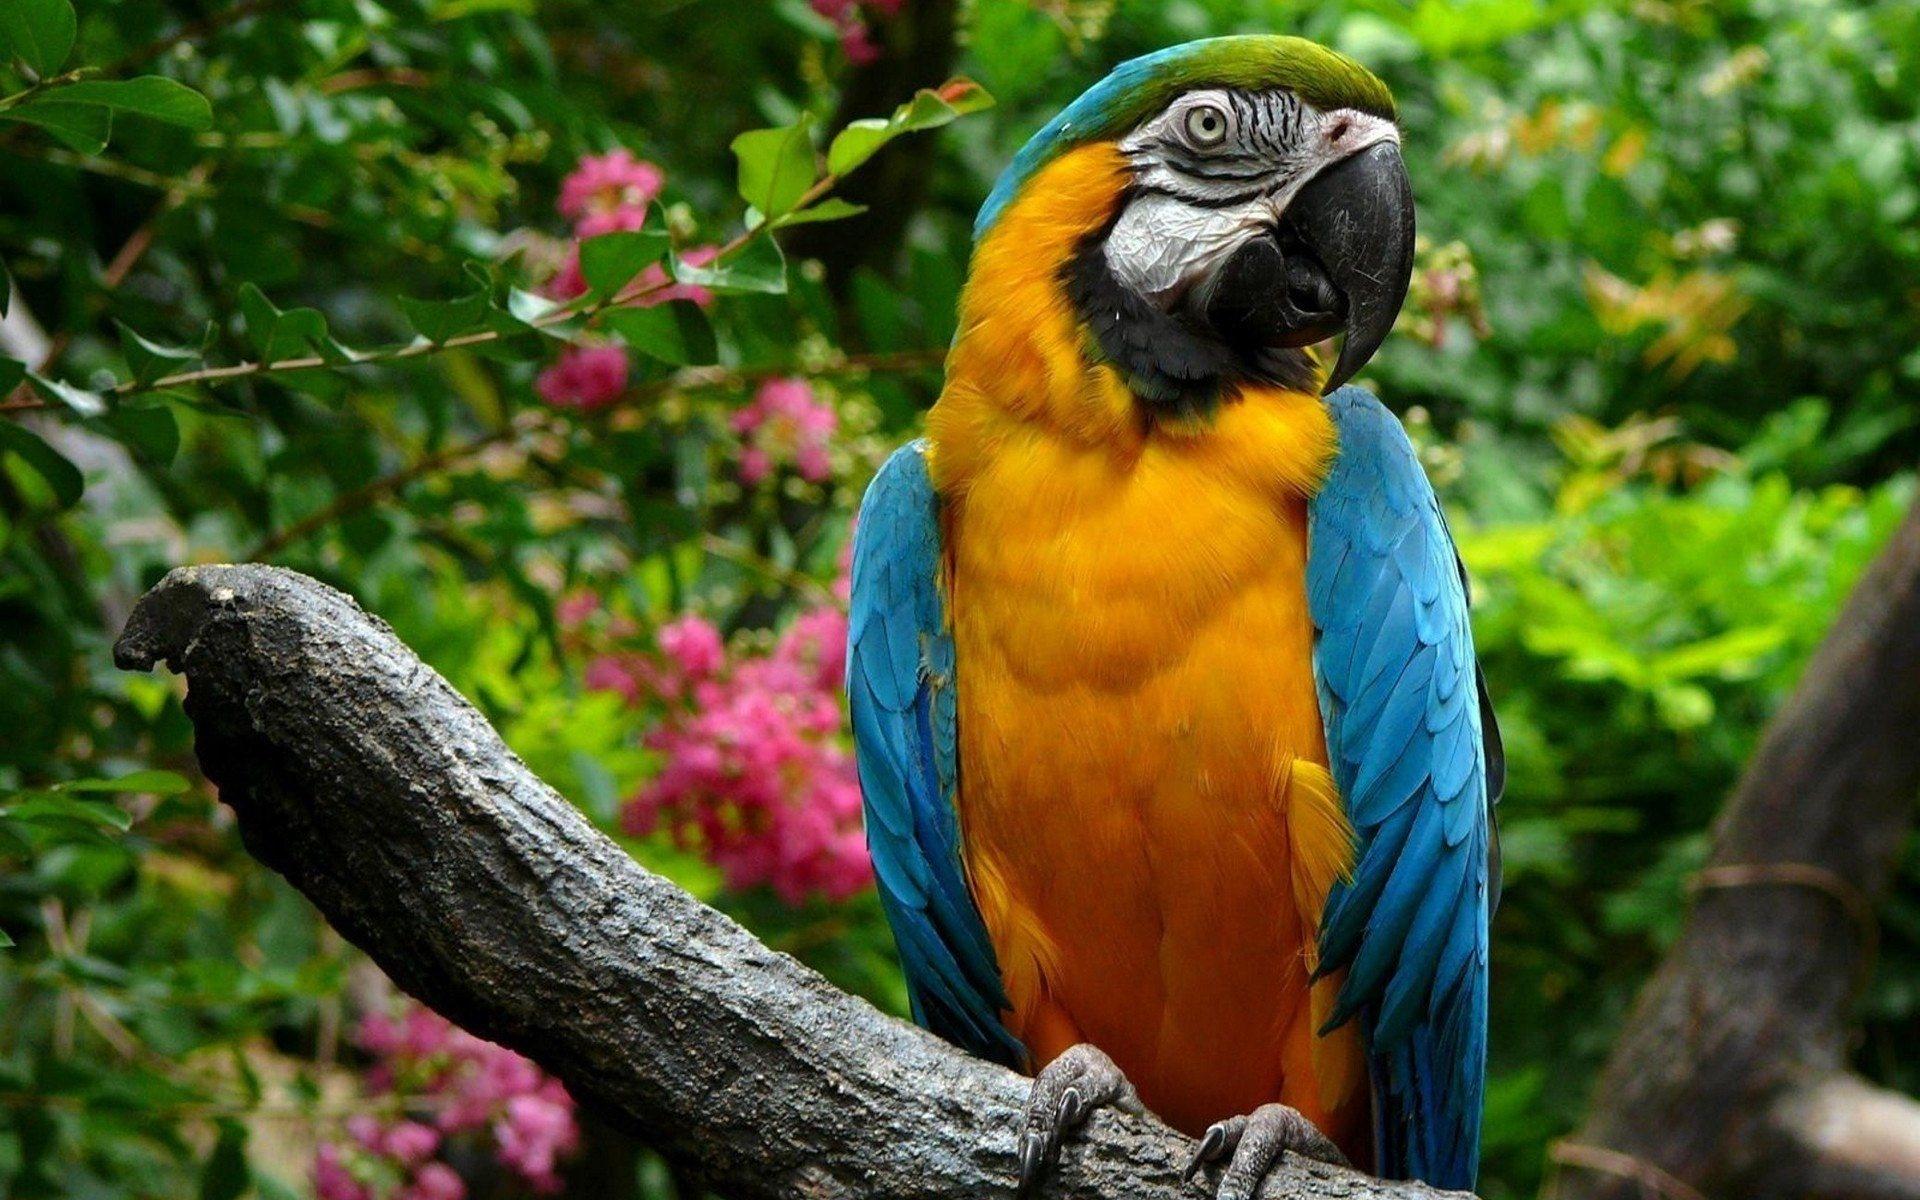 Large Parrots Wallpapers   1920x1200   678181 1920x1200